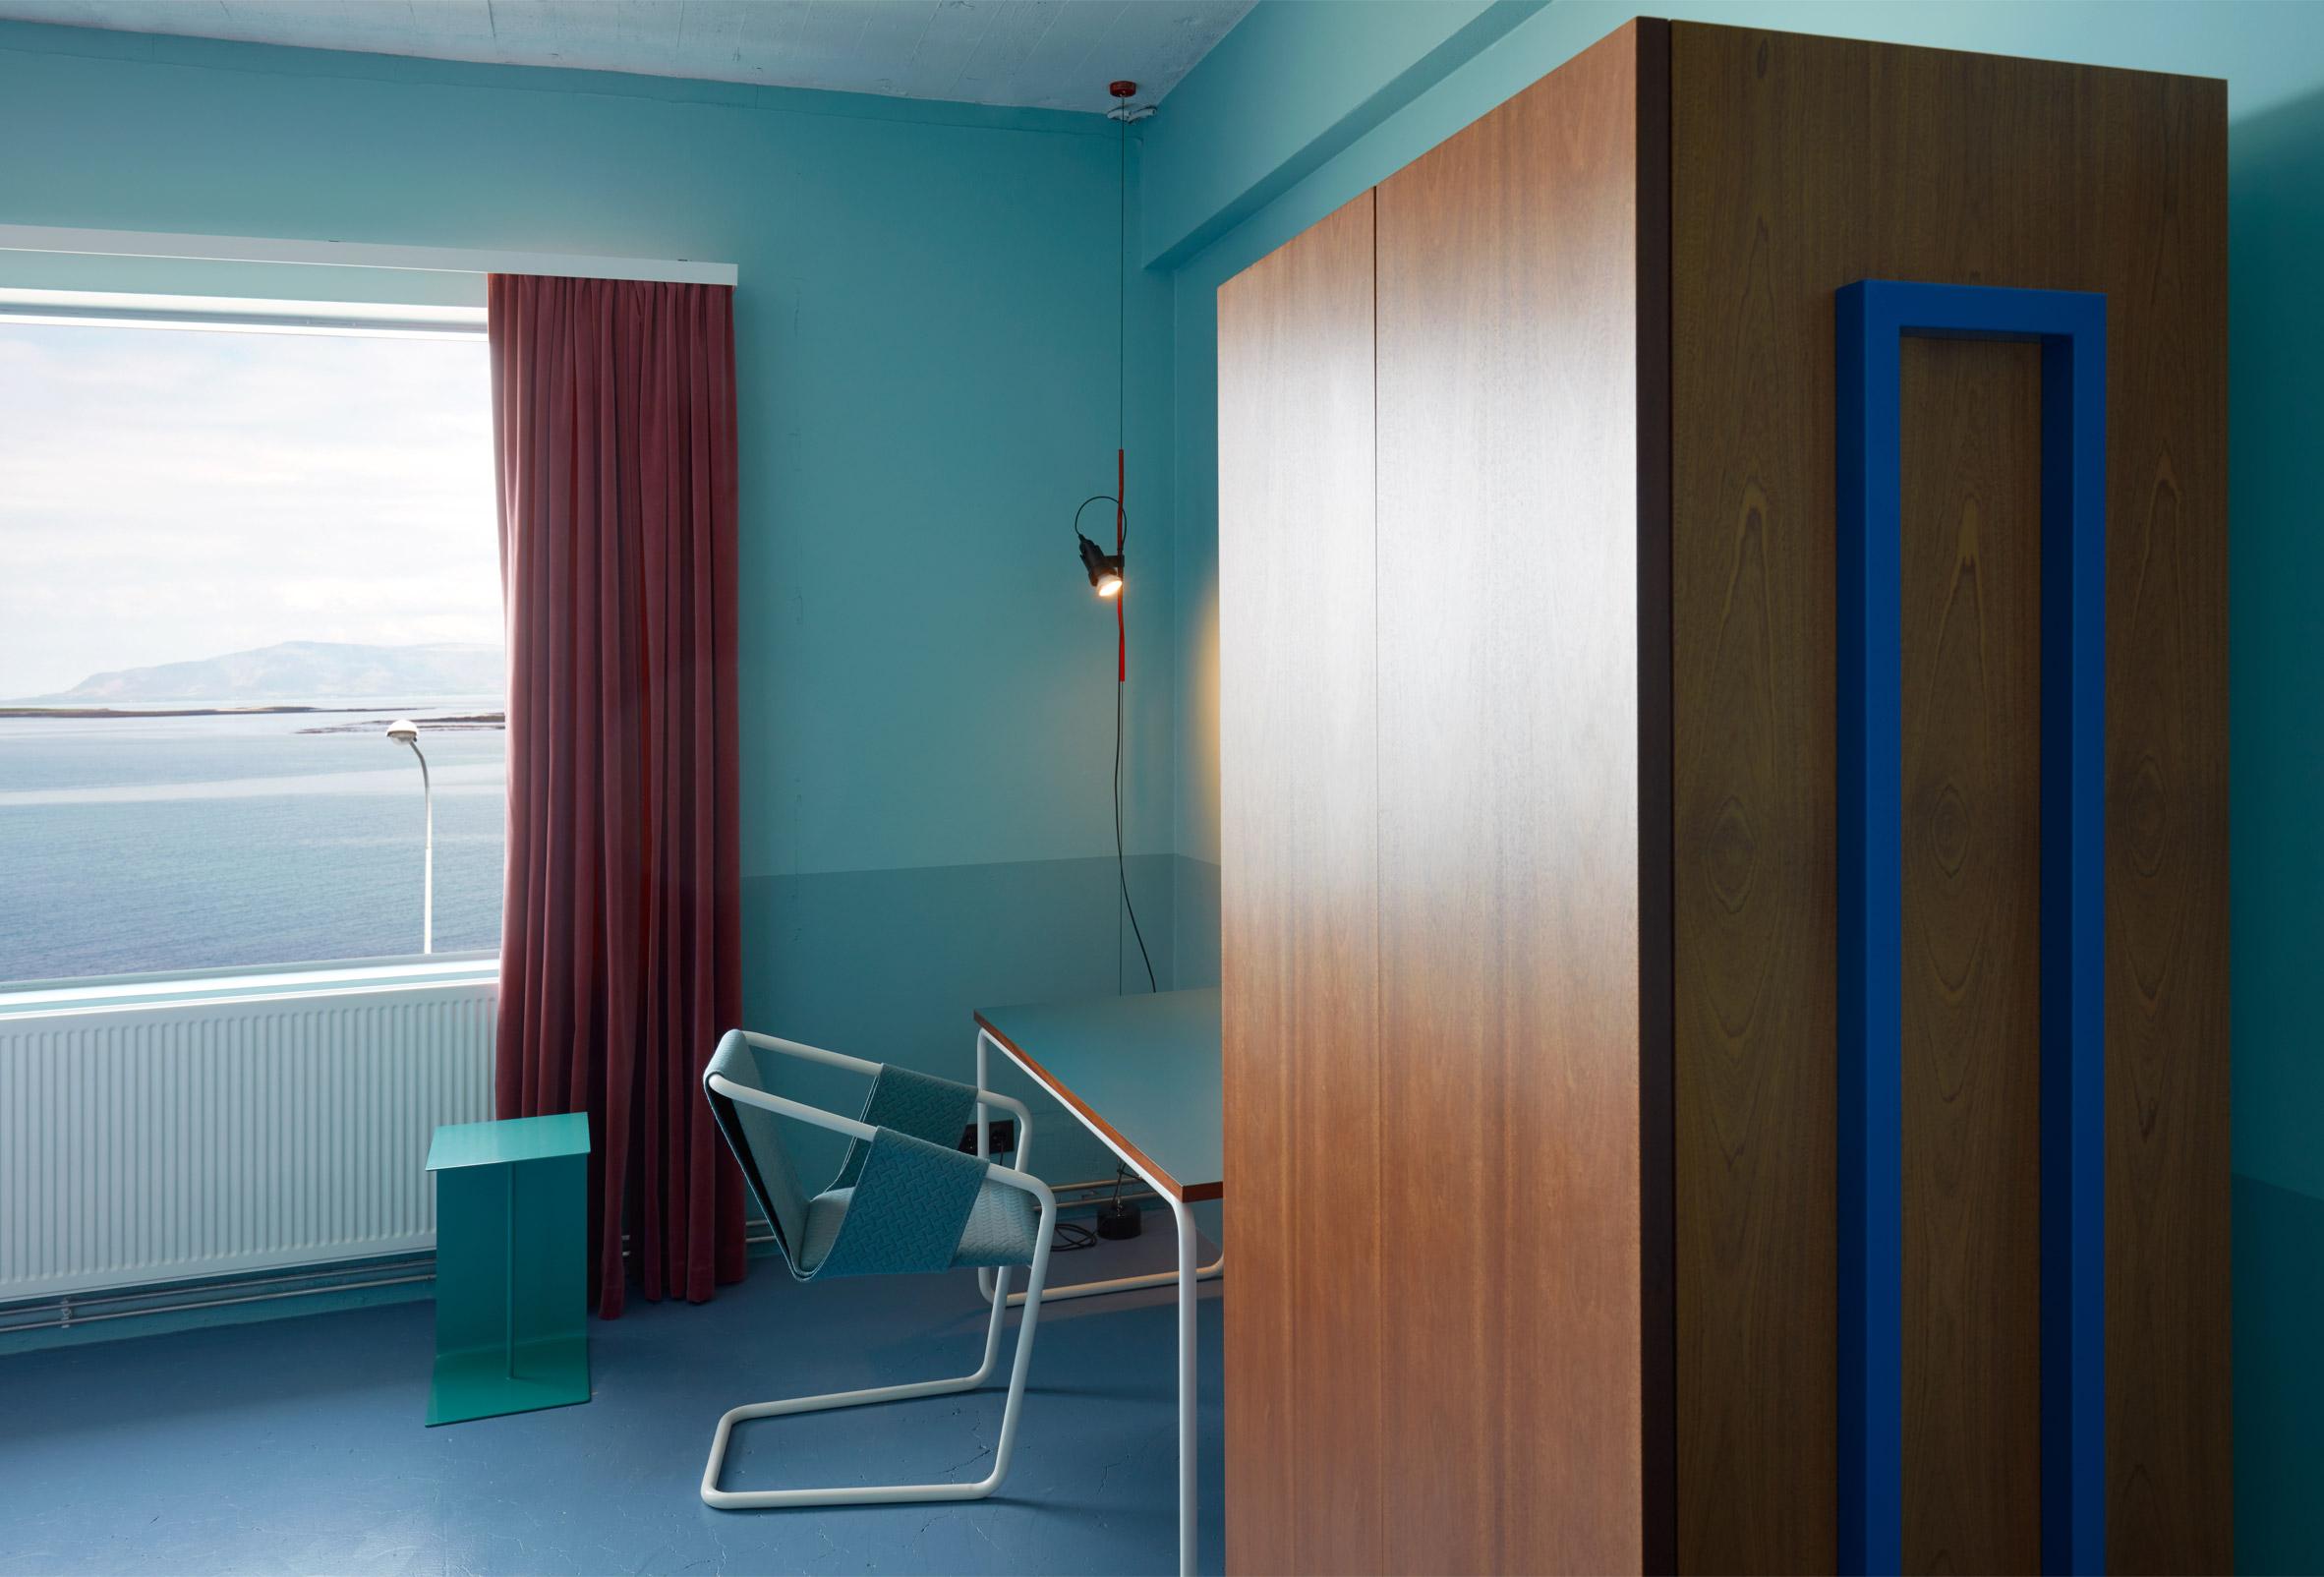 oddsson-hostel-Reykjavik-doolur-iceland_dezeen_2364_col_0